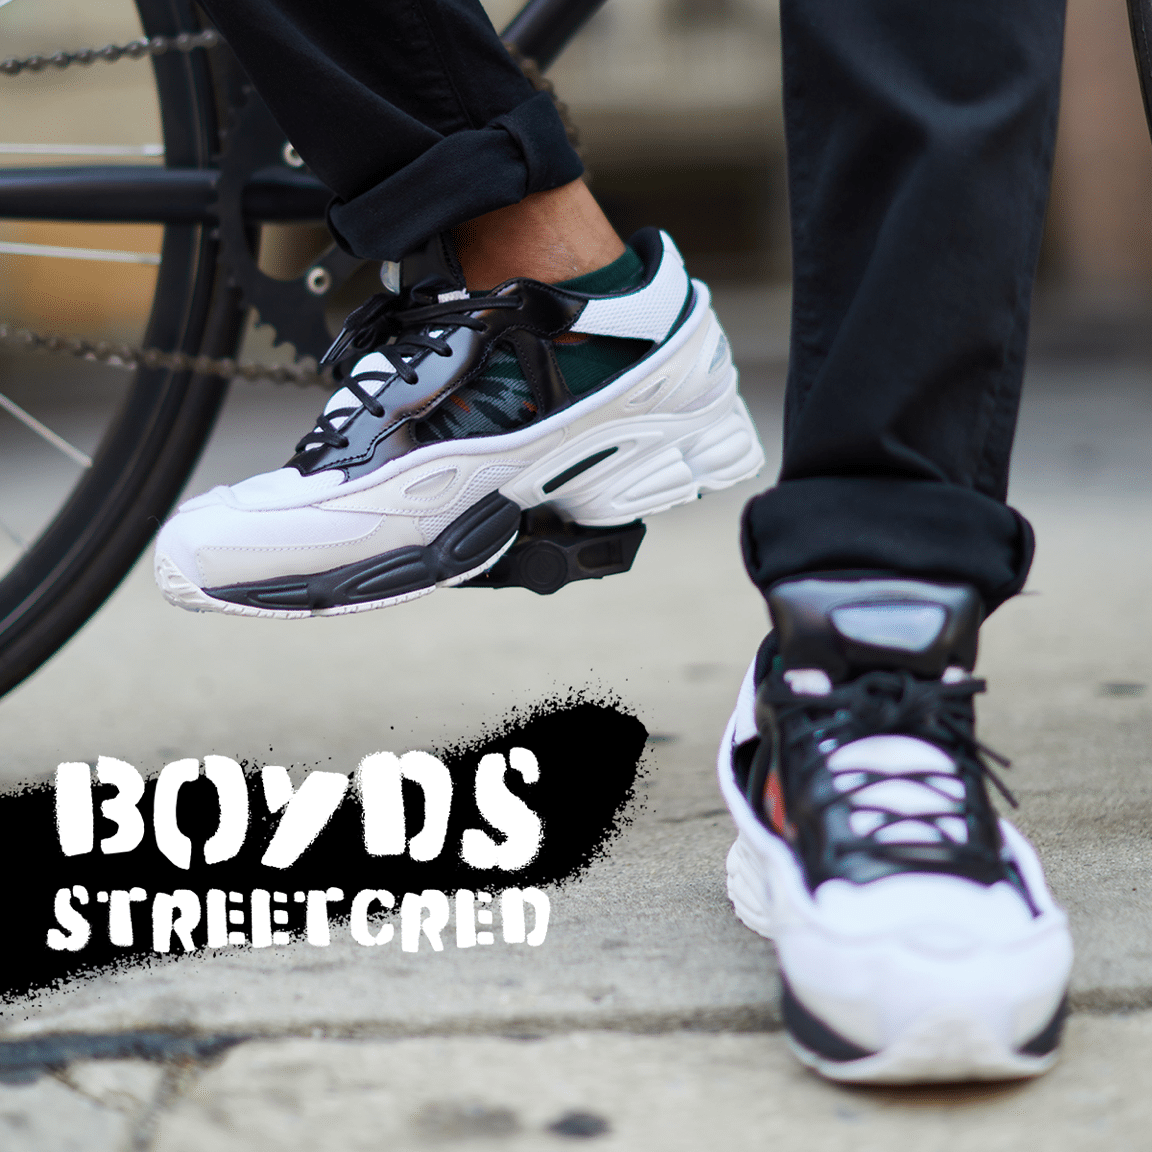 Boyds Philadelphia Giveaway - Raf Simoms x Adidas Originals Ozweego Sneakers